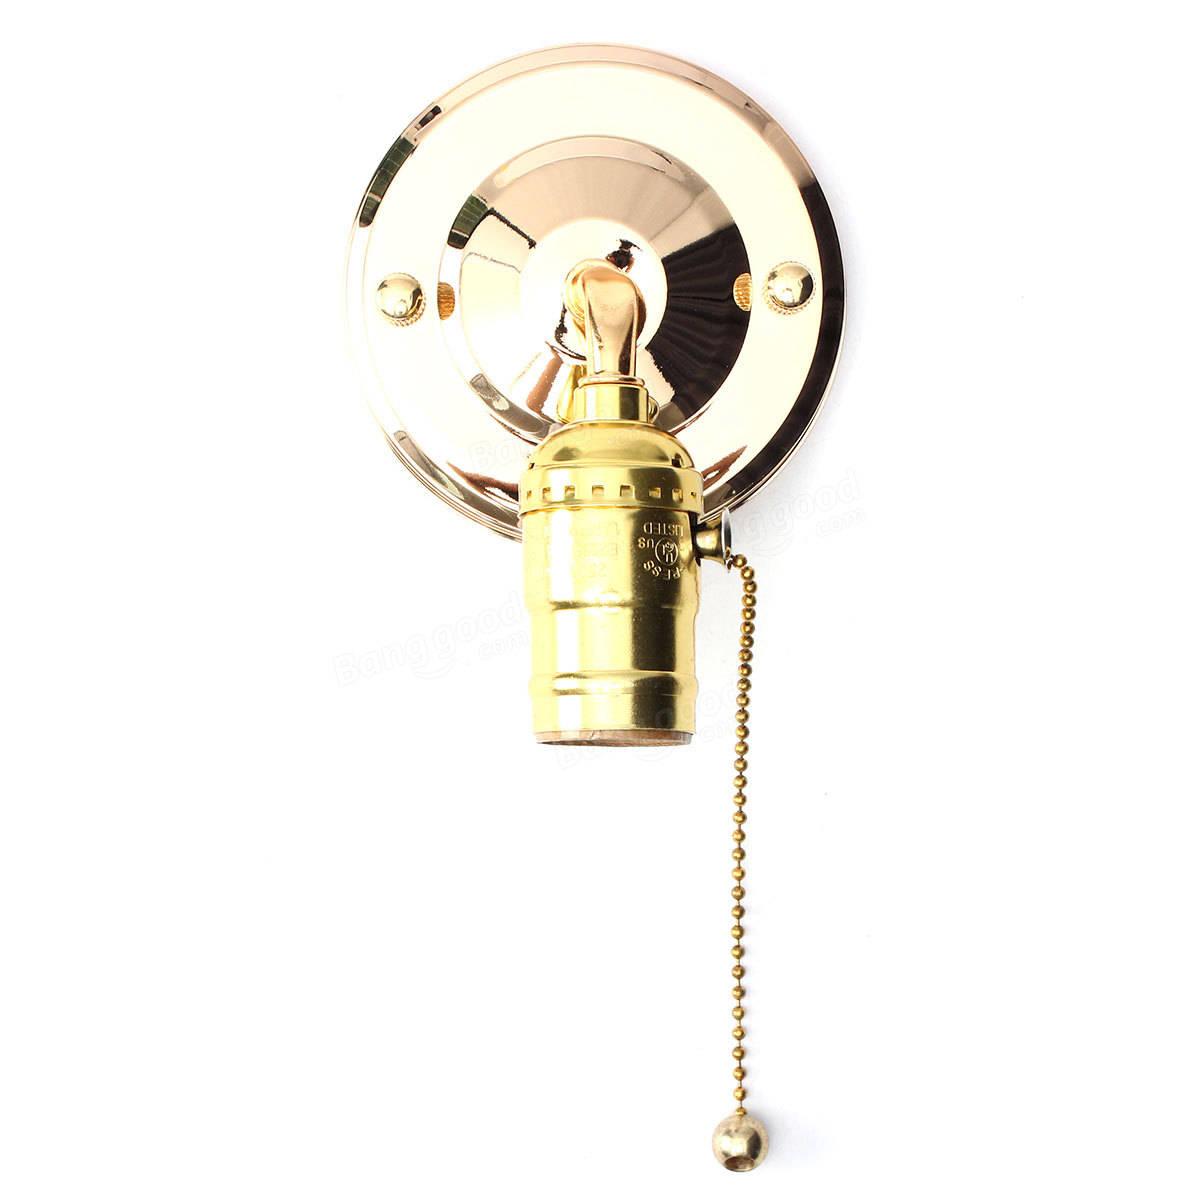 E27 Antique Vintage Wall Light Chain Design Sconce Lamp Bulb Socket Holder Fixture Sale